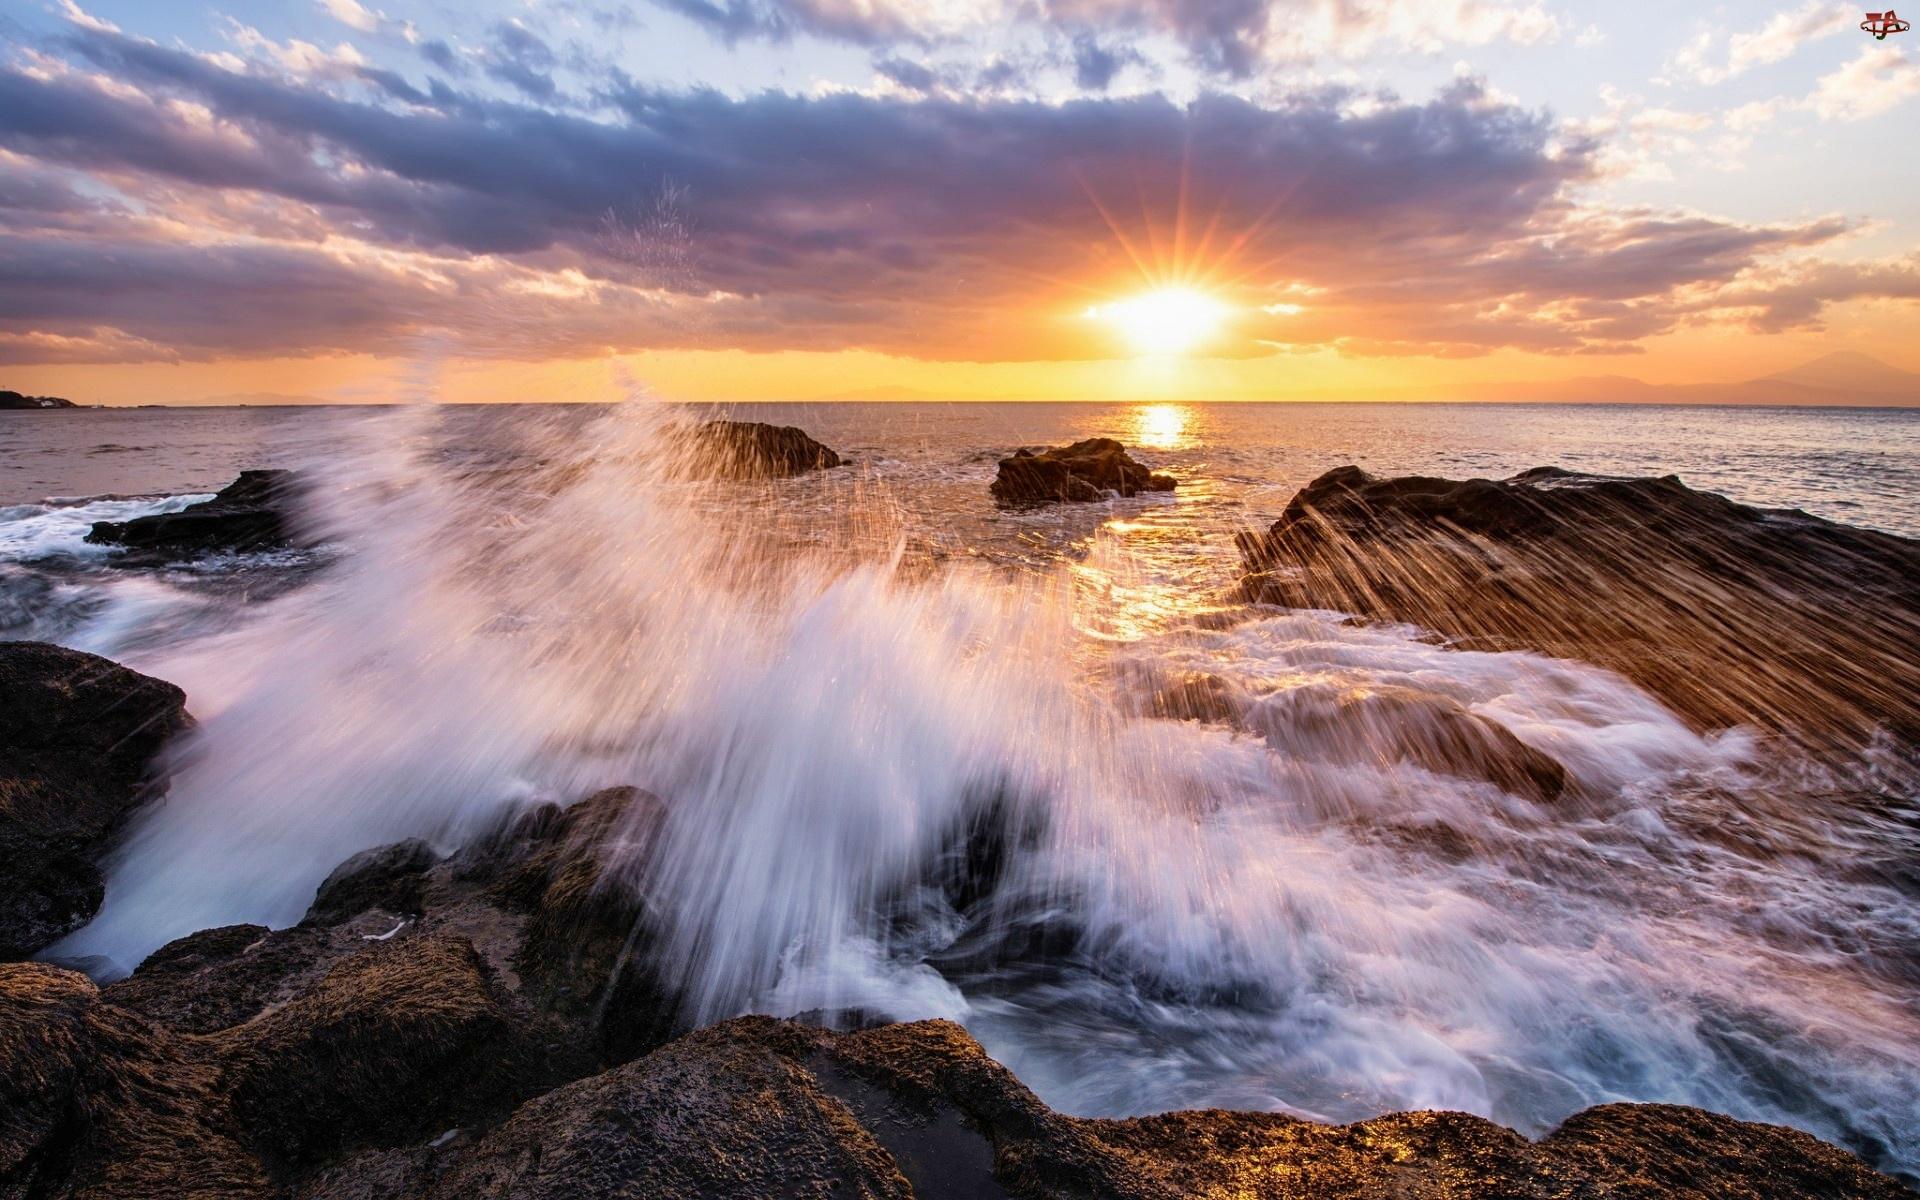 Morze, Słońca, Fale, Wschód